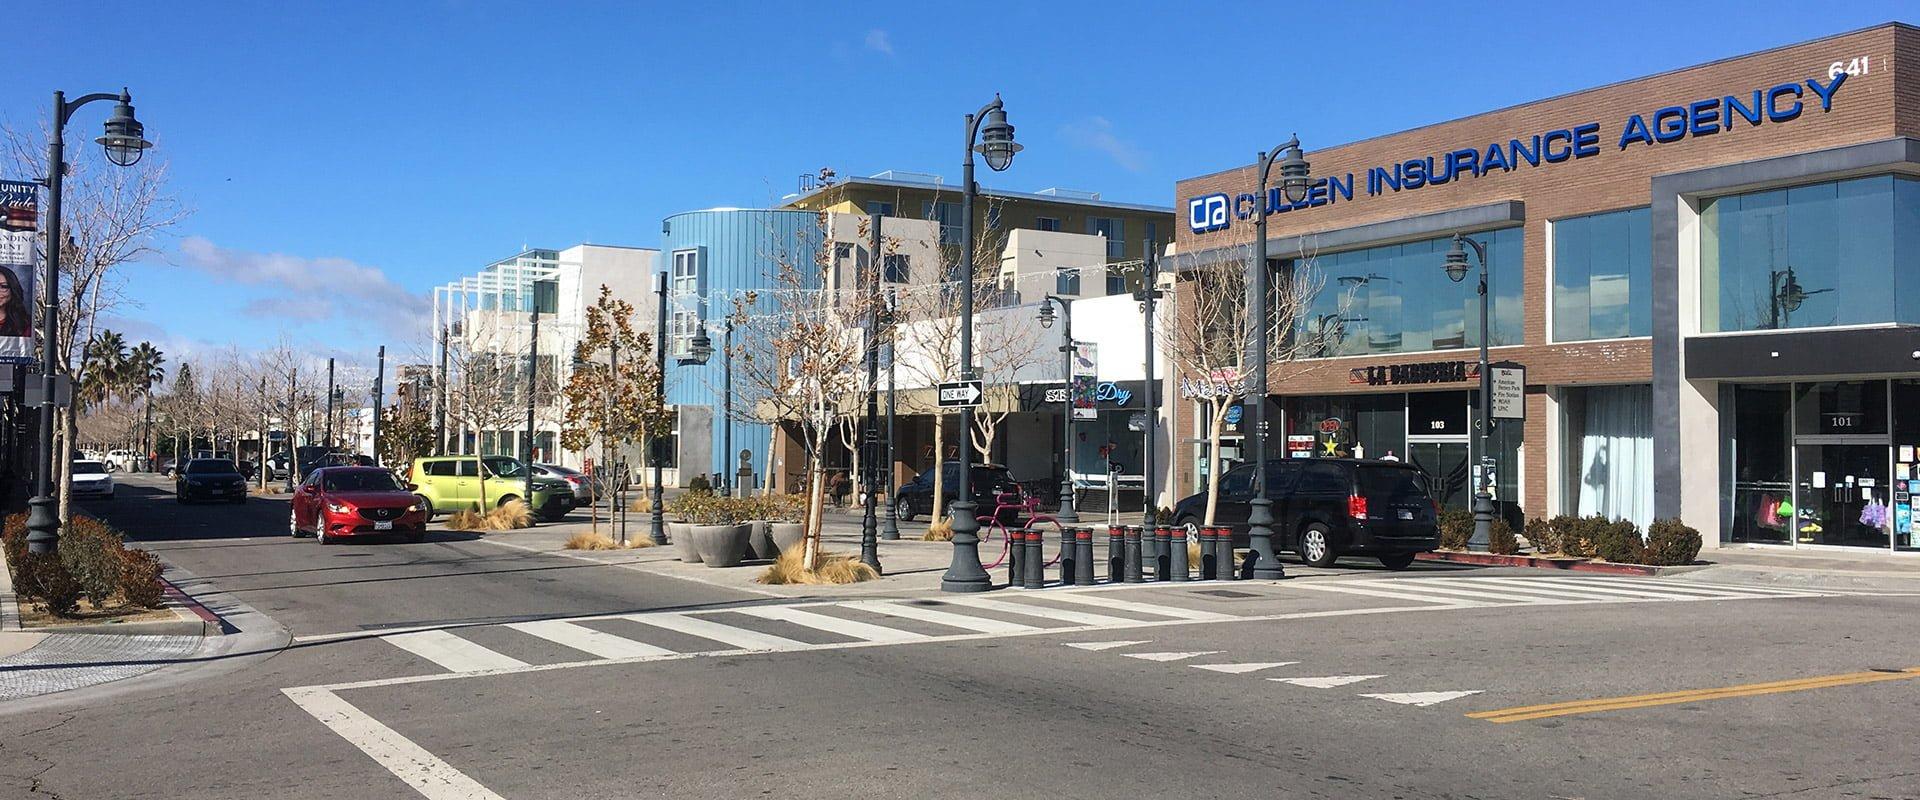 Downtown Lancaster, CA